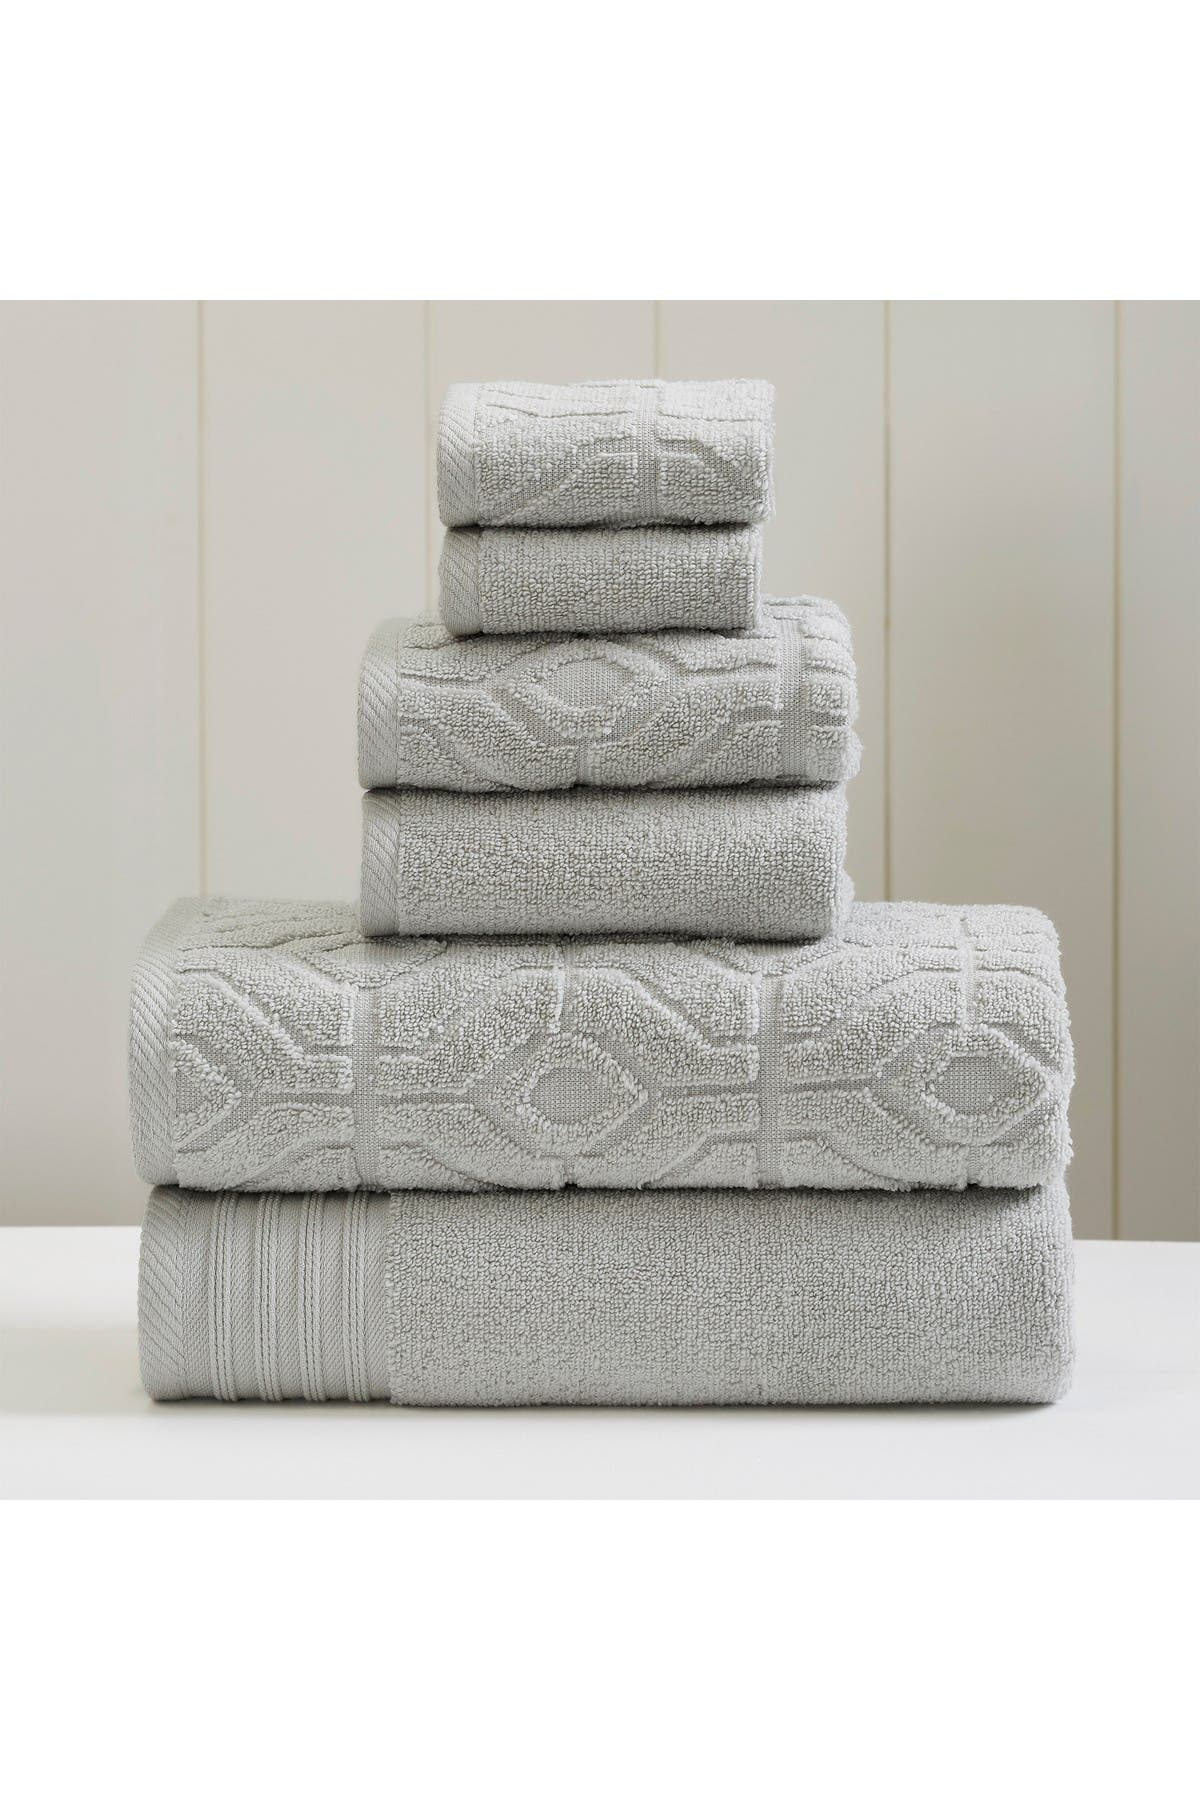 Image of Modern Threads Yarn Dyed Diamond Gate 6-Piece Towel Set - Silver